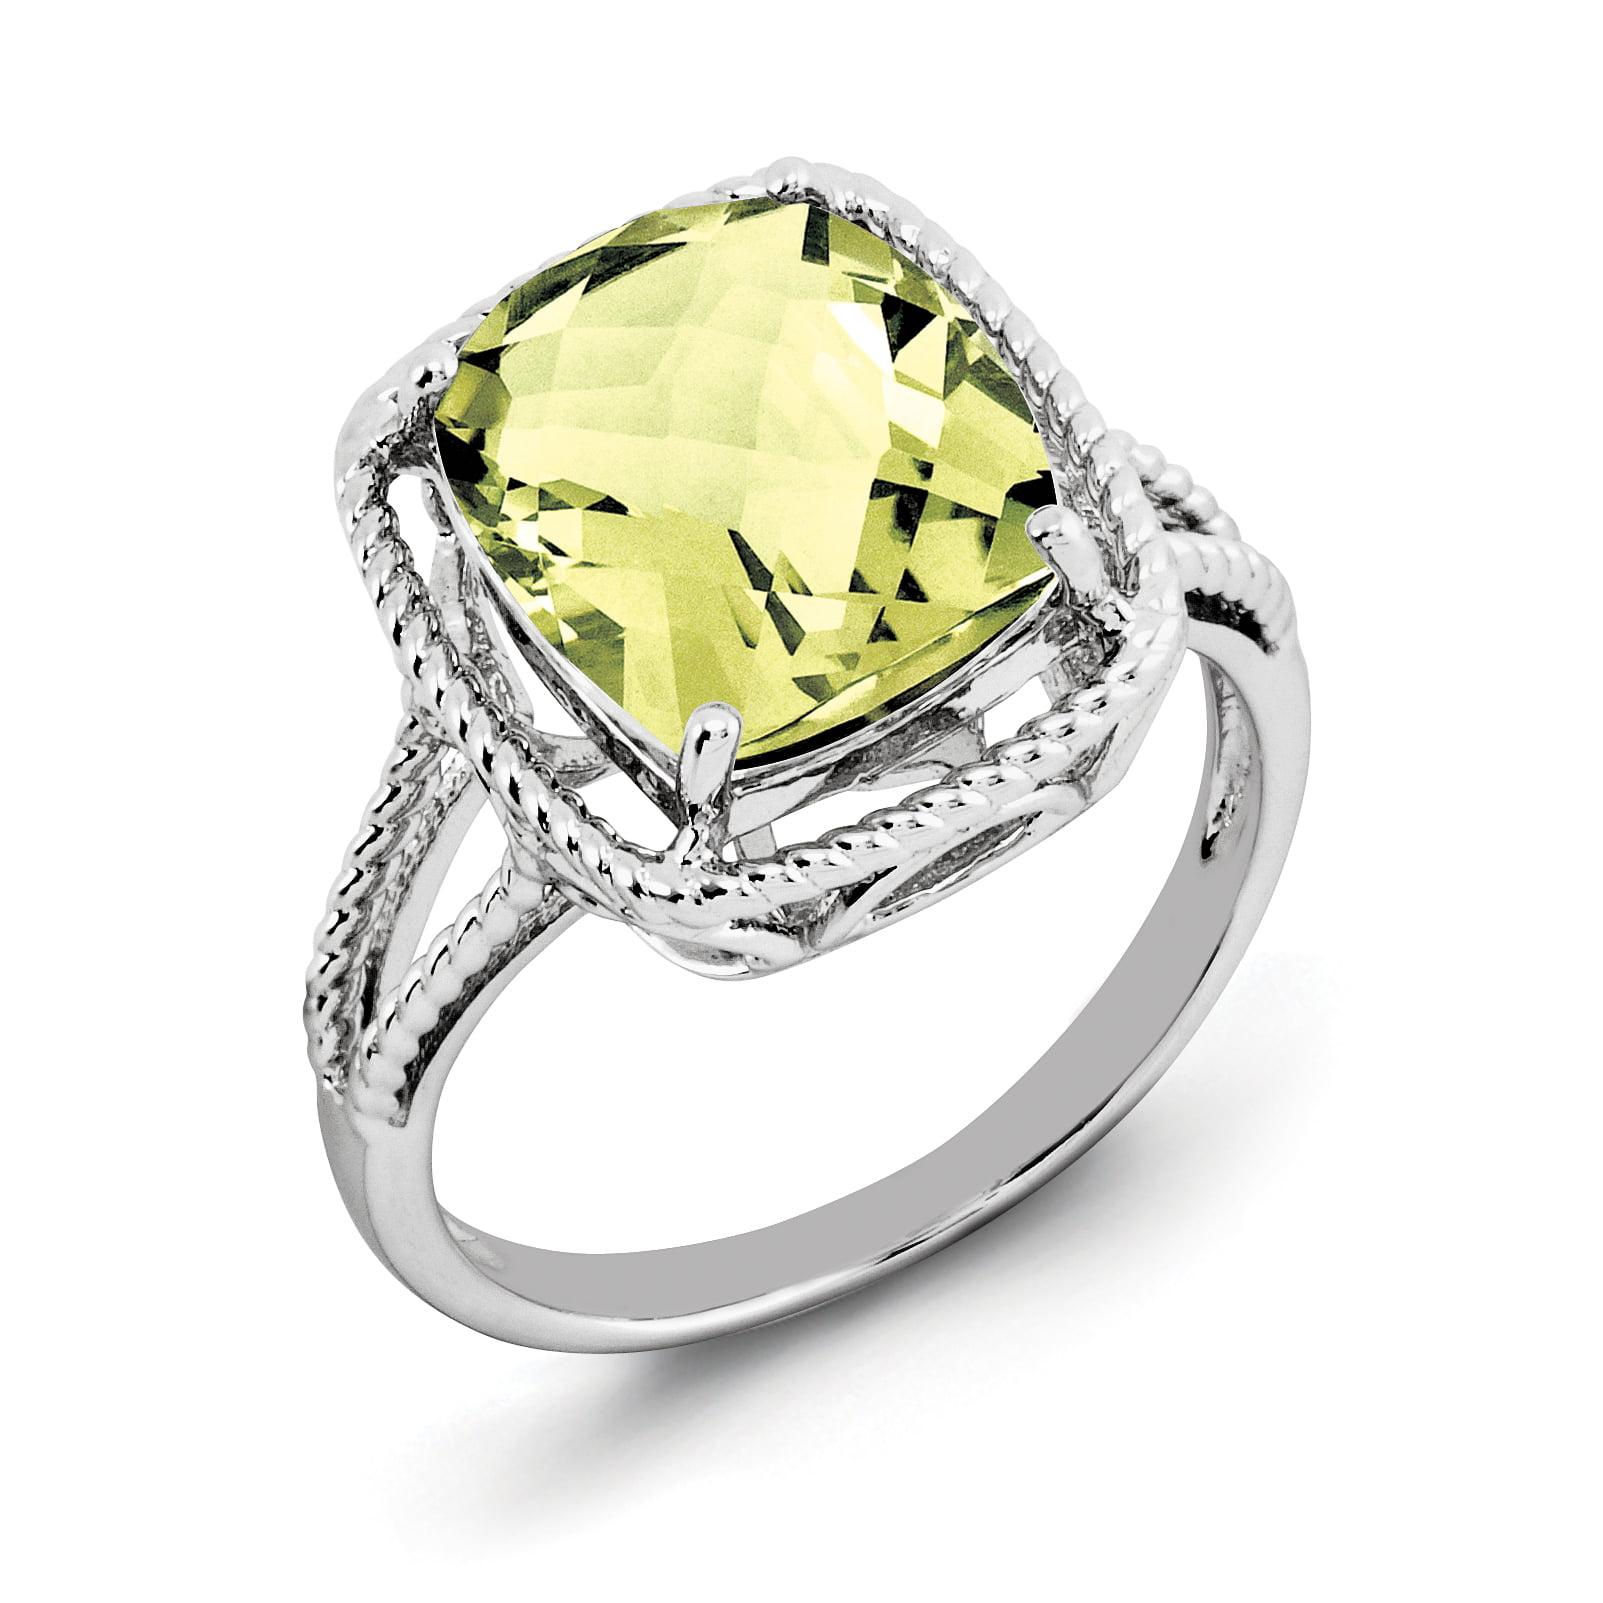 Sterling Silver Rhodium Checker-Cut Lemon Quartz Ring Size 7 - image 2 de 2